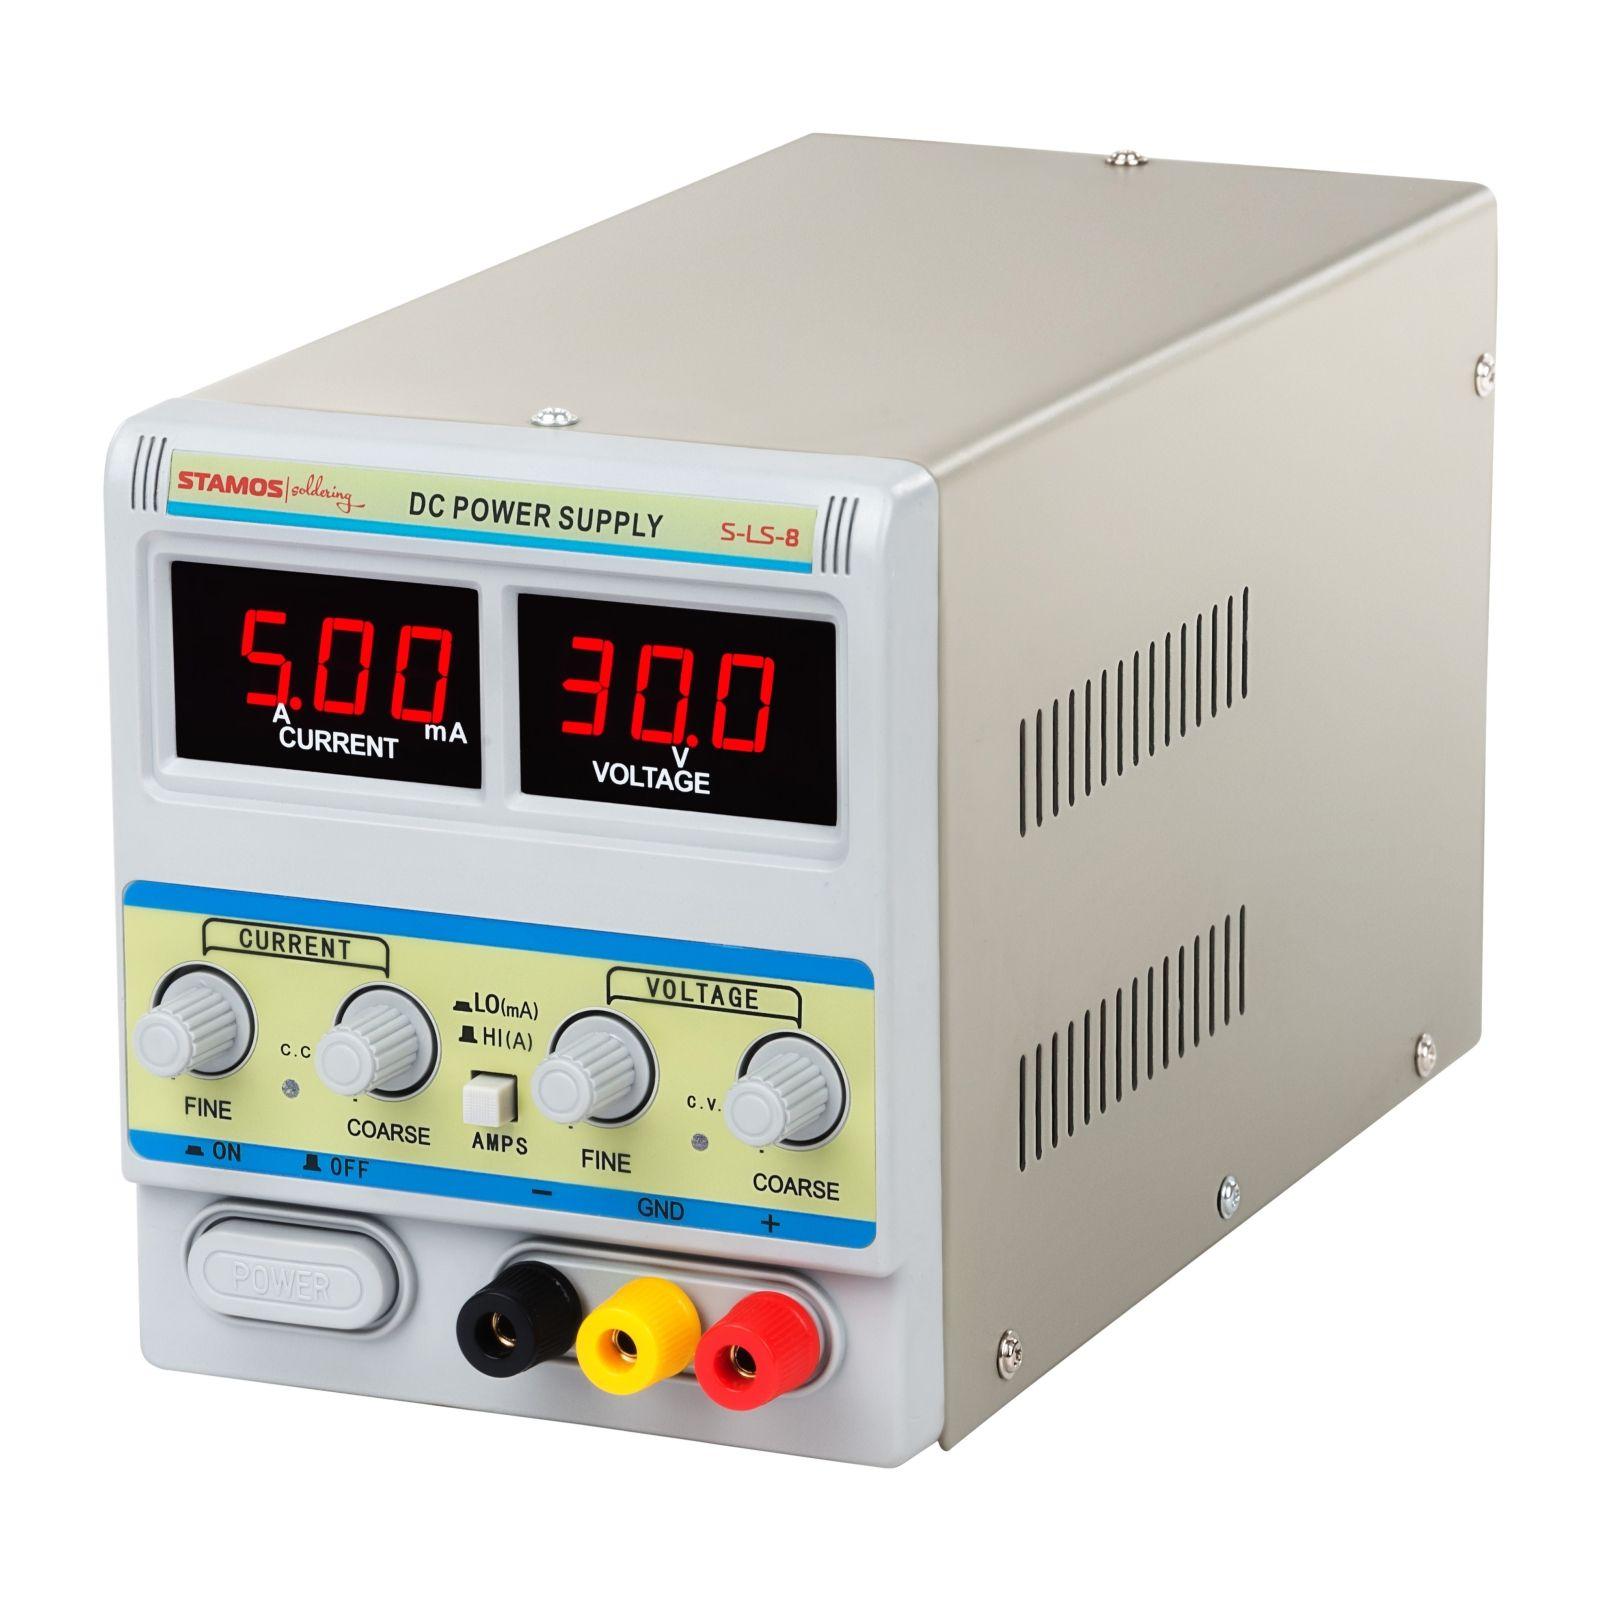 Fuente-De-Alimentacion-Laboratorio-Sistema-Suministro-Corriente-DC-Pantalla-LED